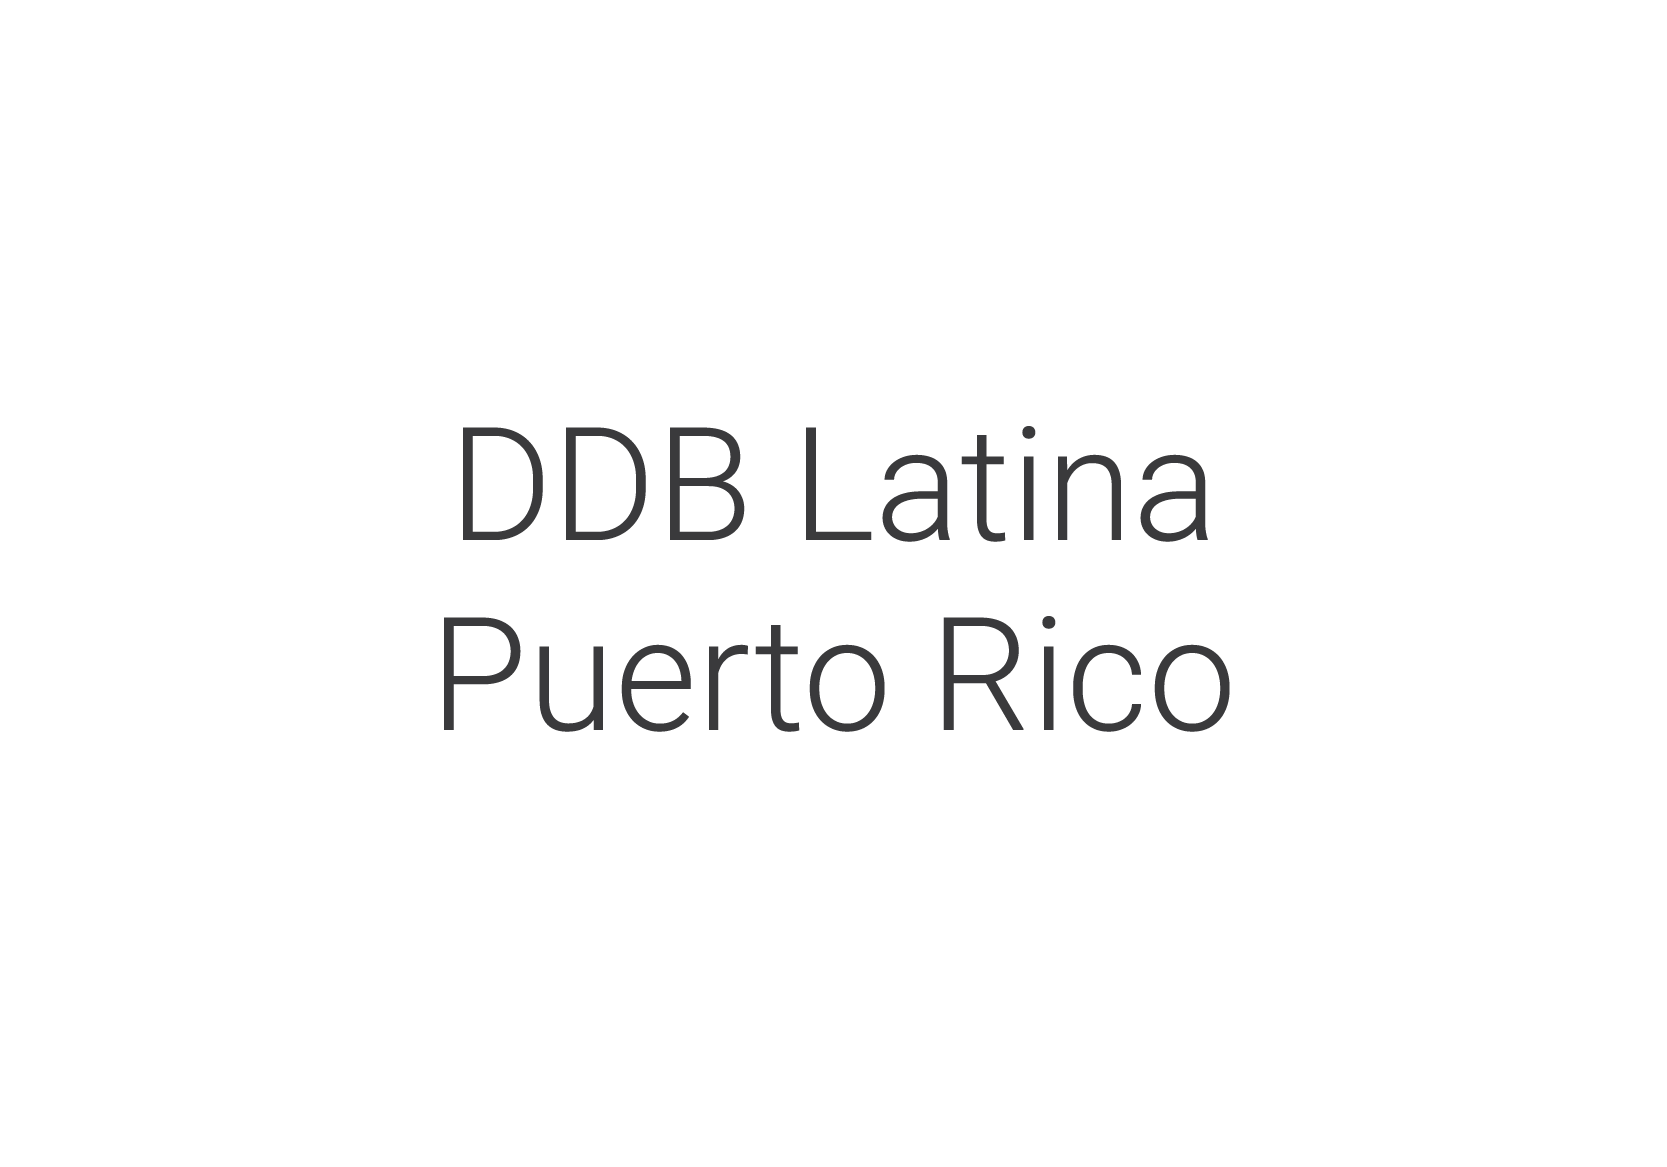 DDB Latina Puerto Rico